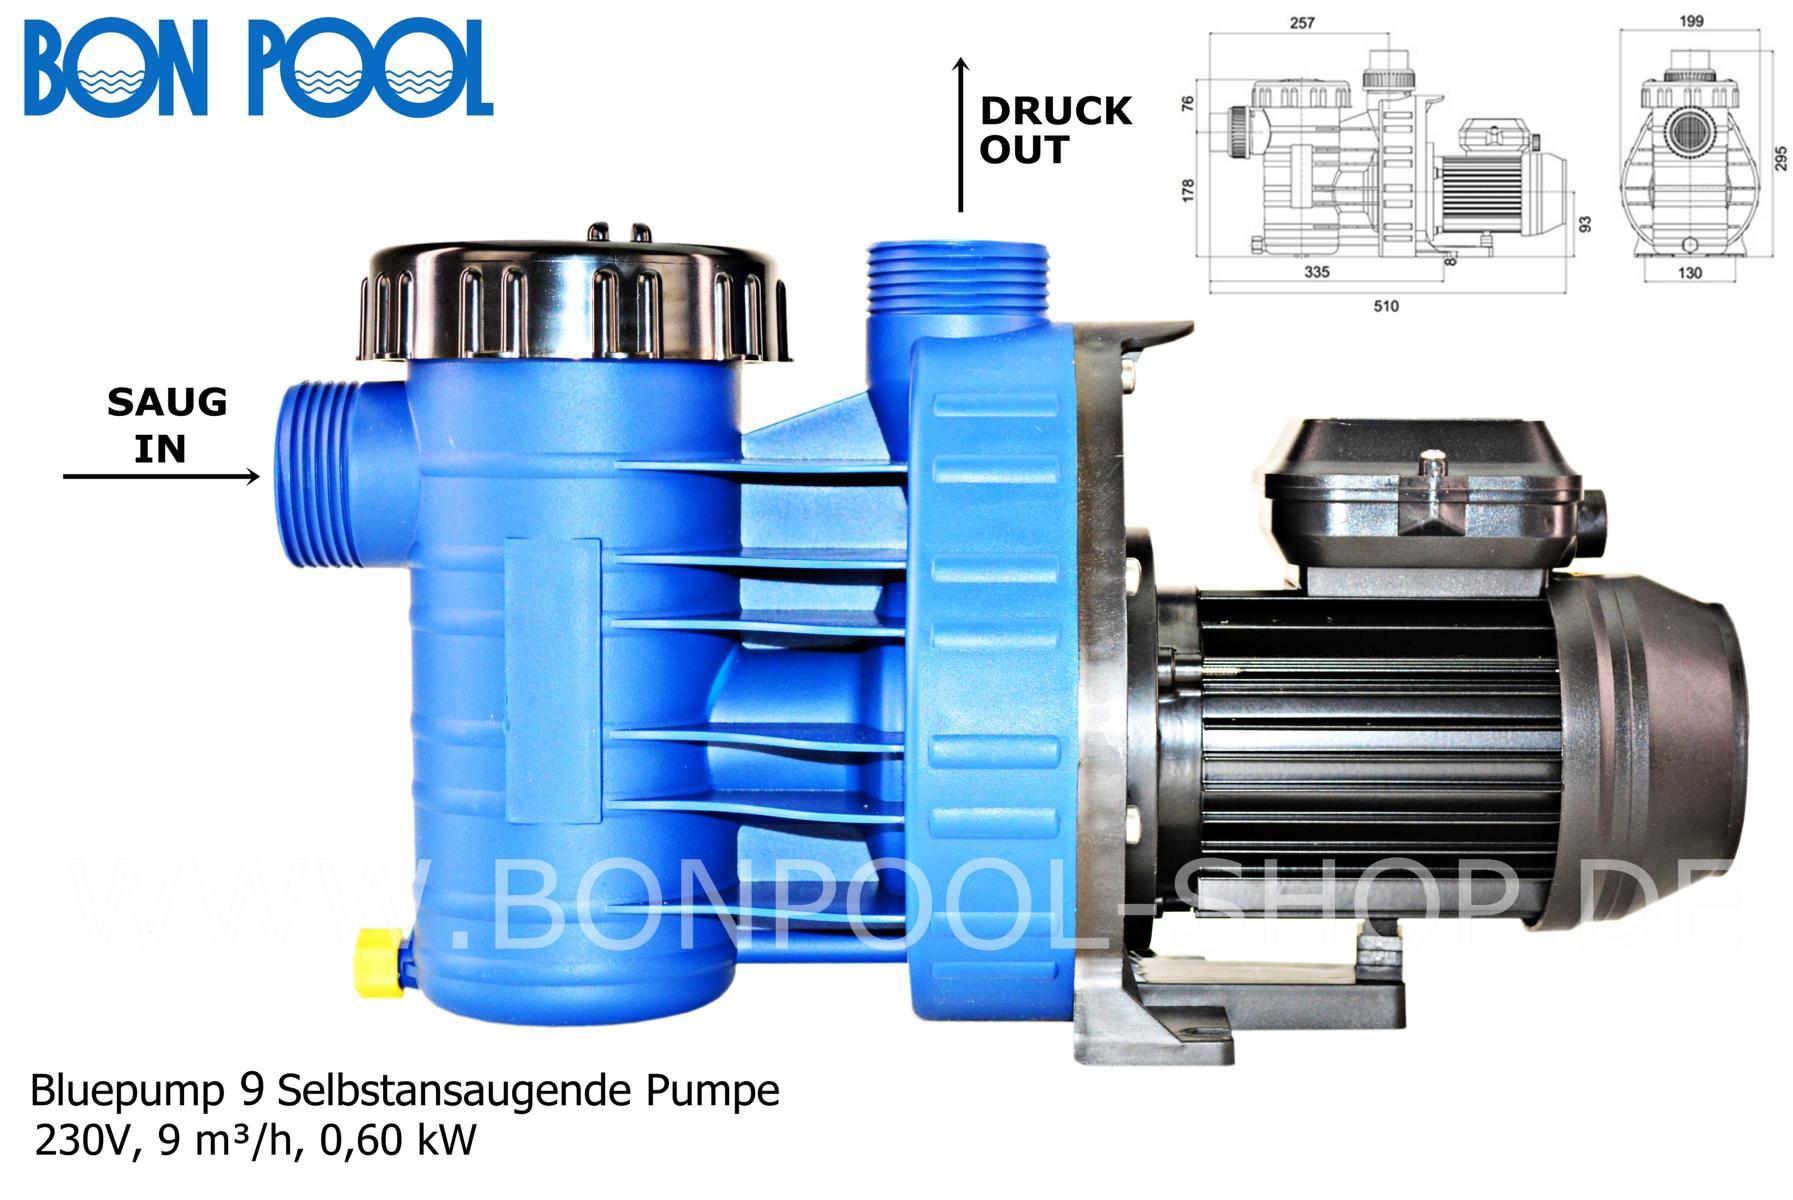 Bluepump 9 selbstansaugende pumpe bon pool for Pool aufstellbar